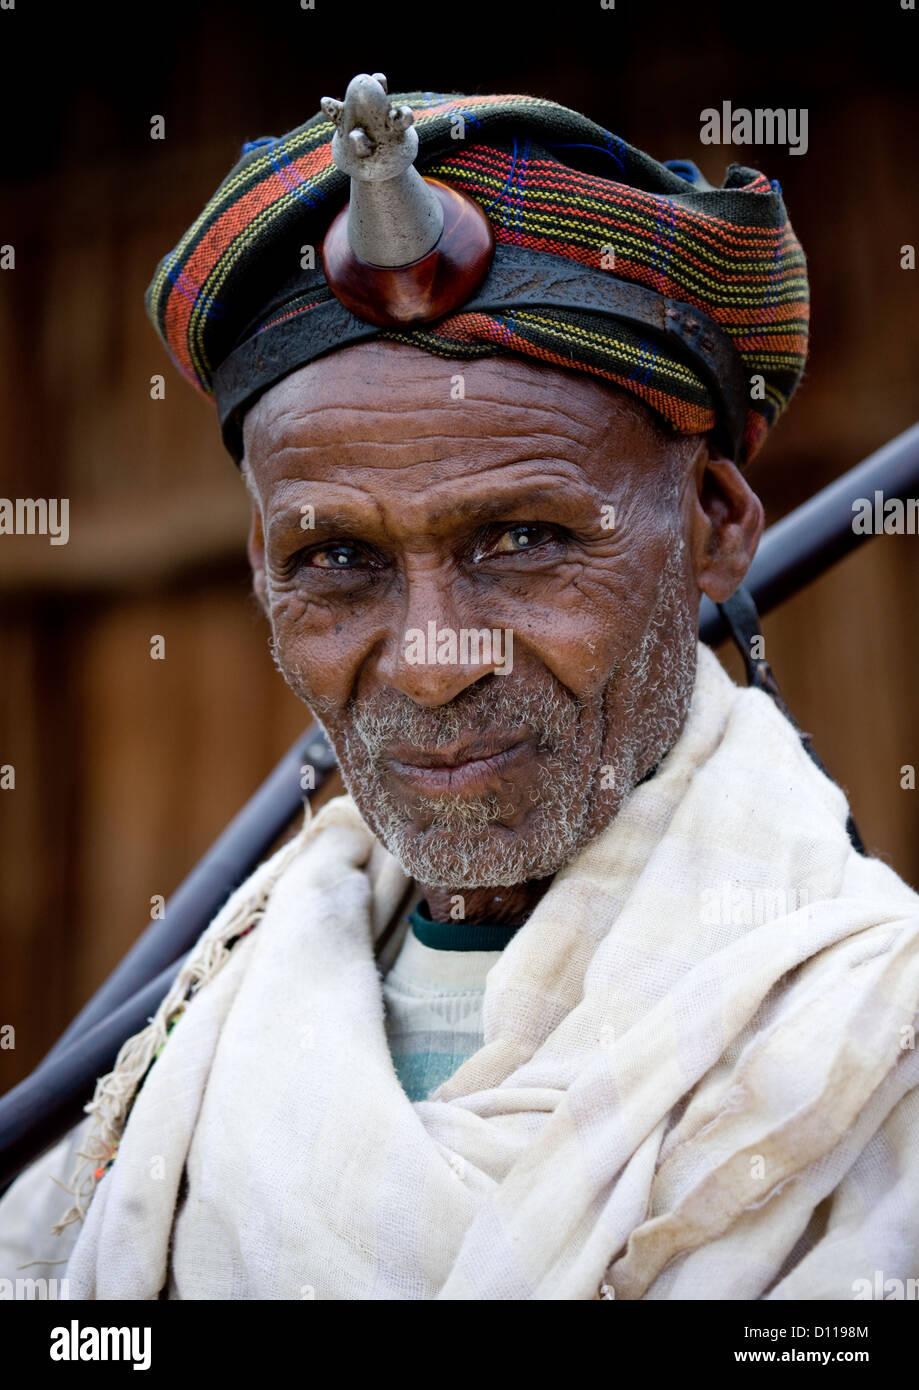 Portrait Of A Smiling Borana Tribe Chief Wearing The Kalasha On His Forehead, Yabello, Omo Valley, Ethiopia - Stock Image